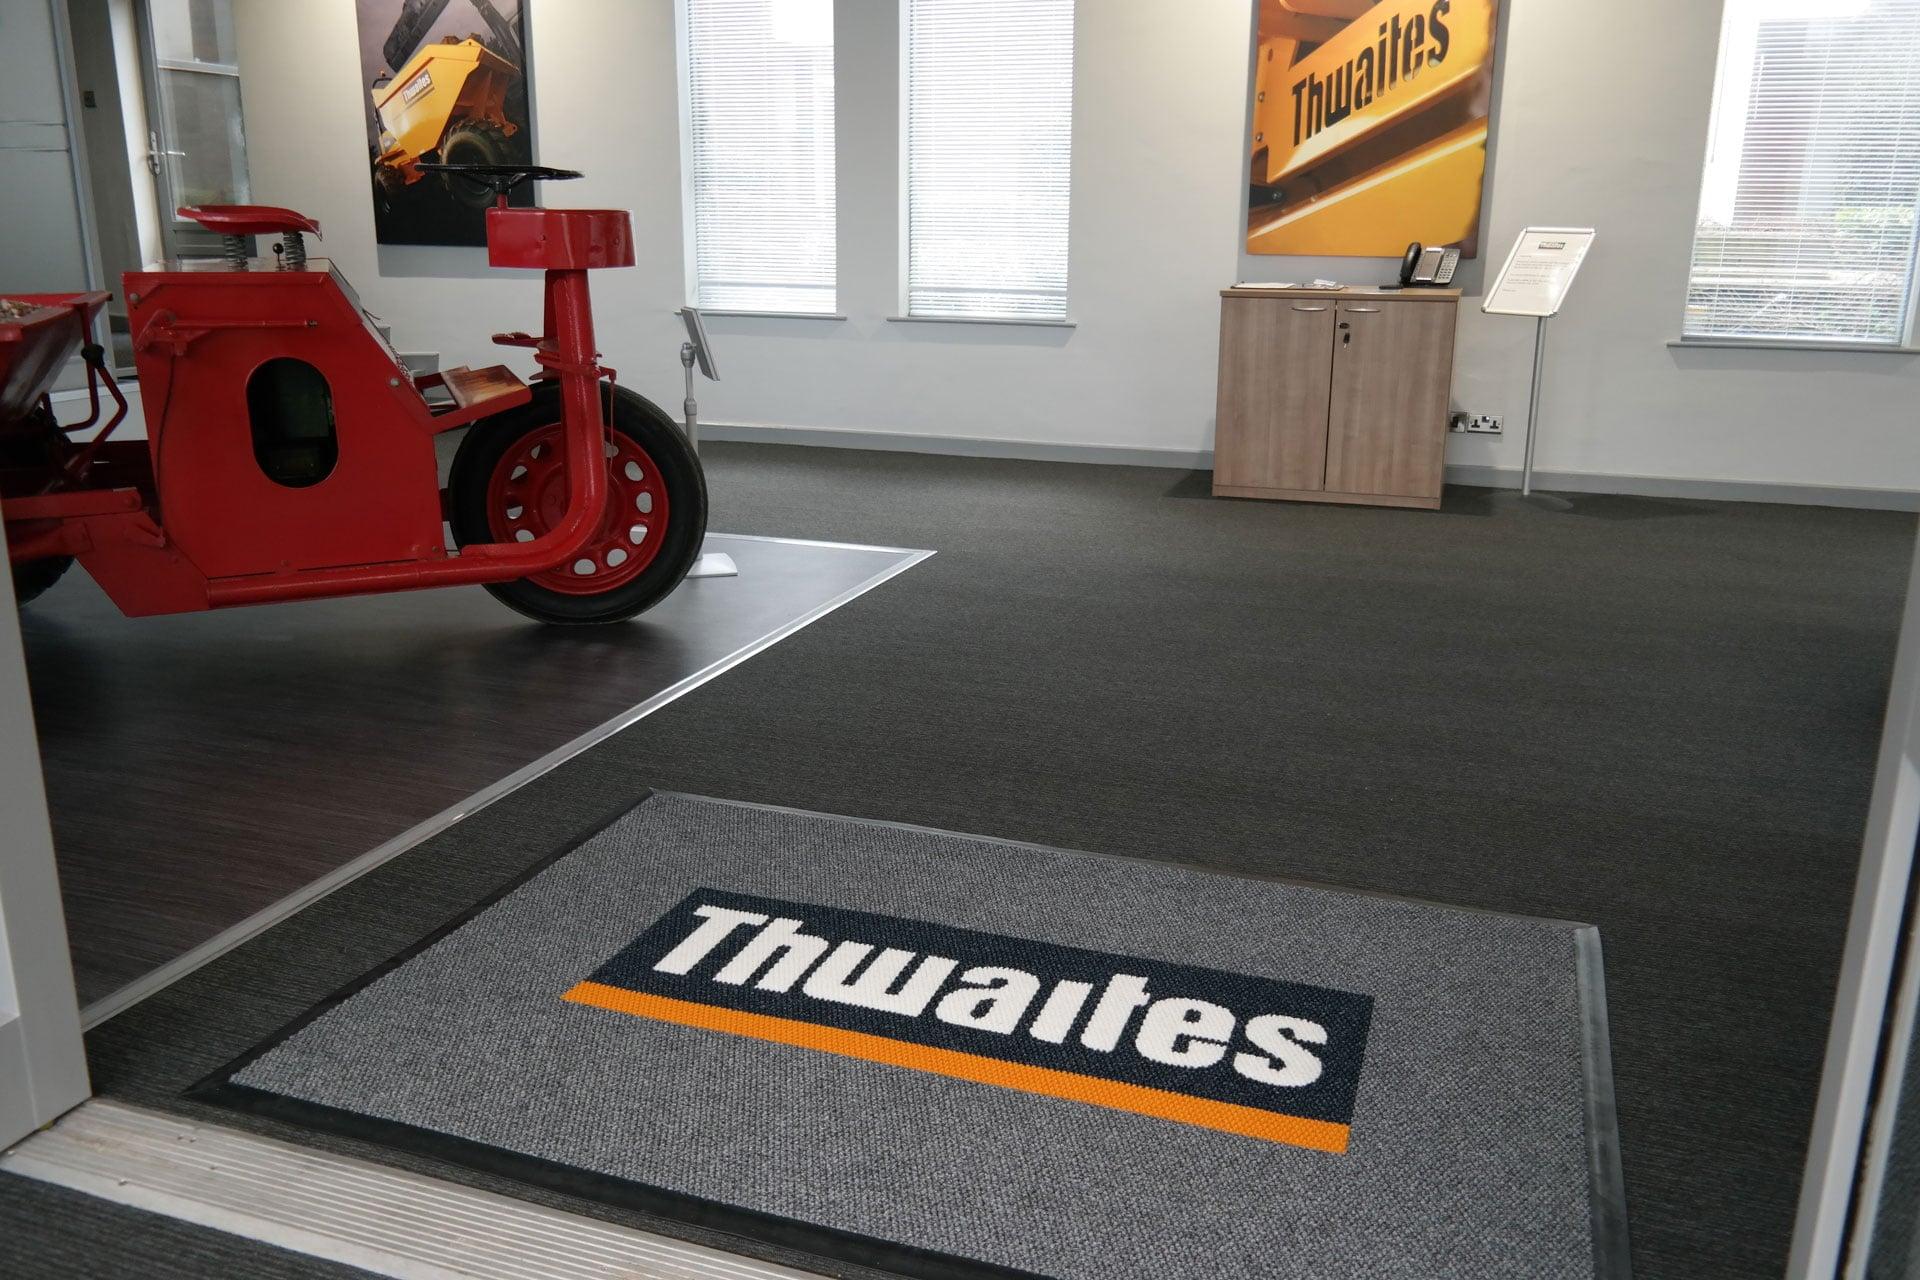 Thwaites Entrance Logomat